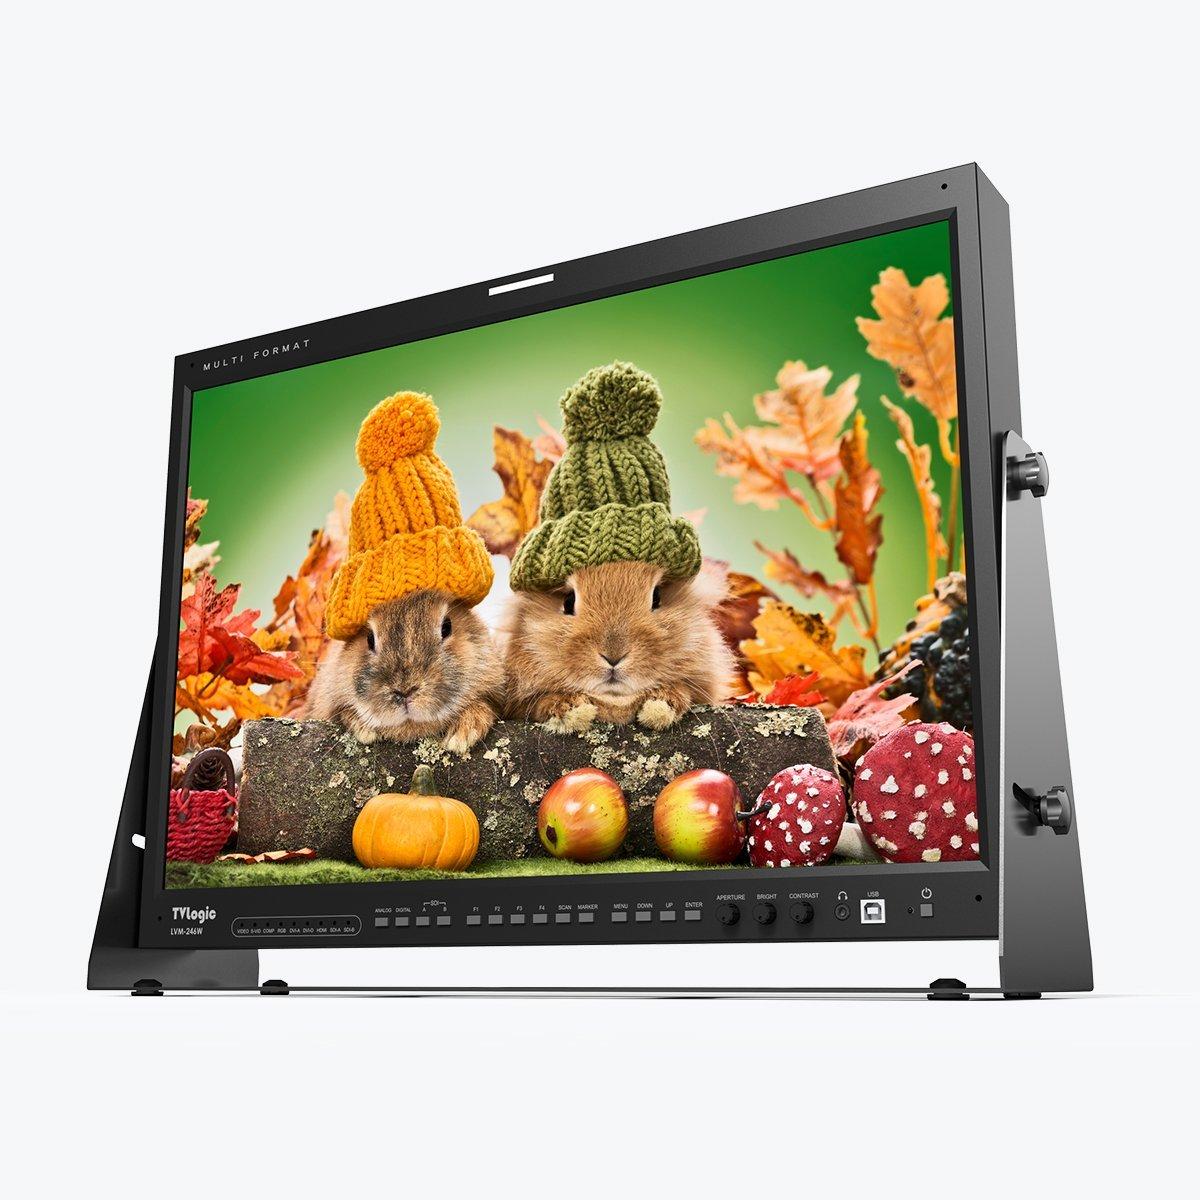 "TVLogic LVM-246W 24"" Full HD Professional LCD Monitor"